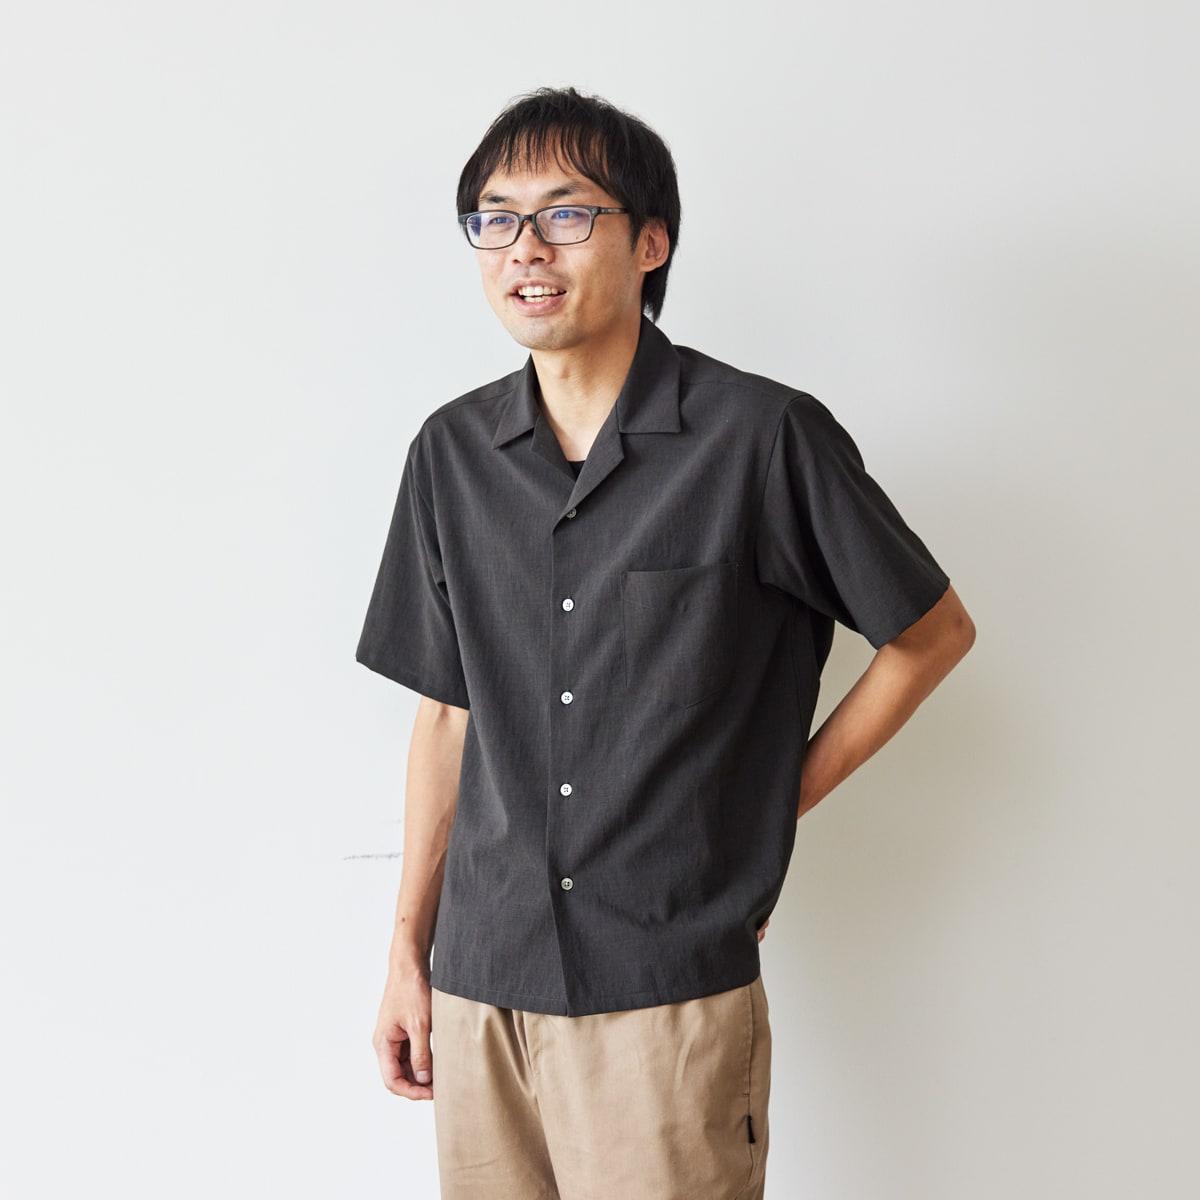 Masakazu Ioka